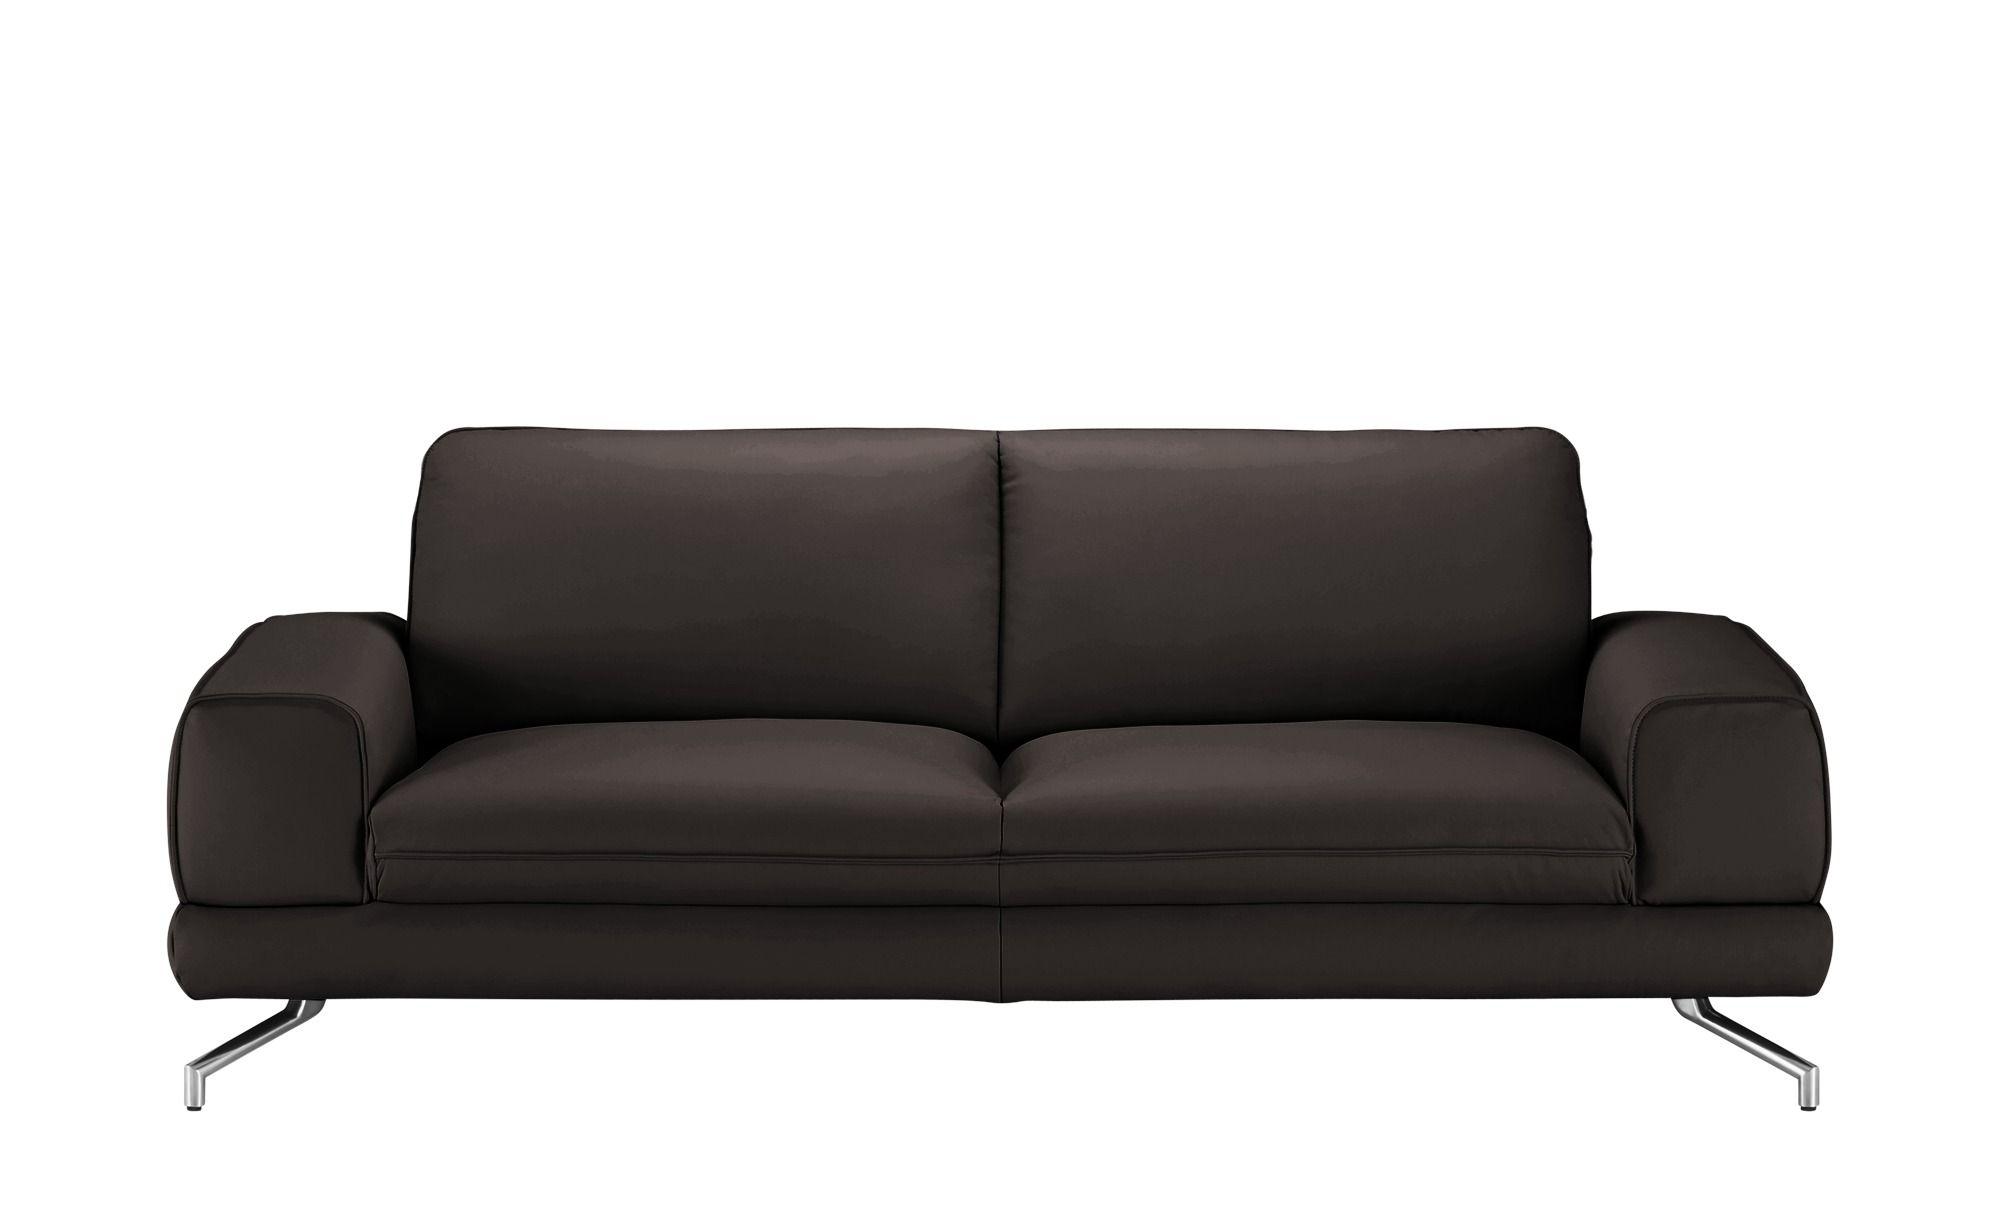 Kunstleder Couch Gunstig Ledersofa Neu Beziehen Munchen